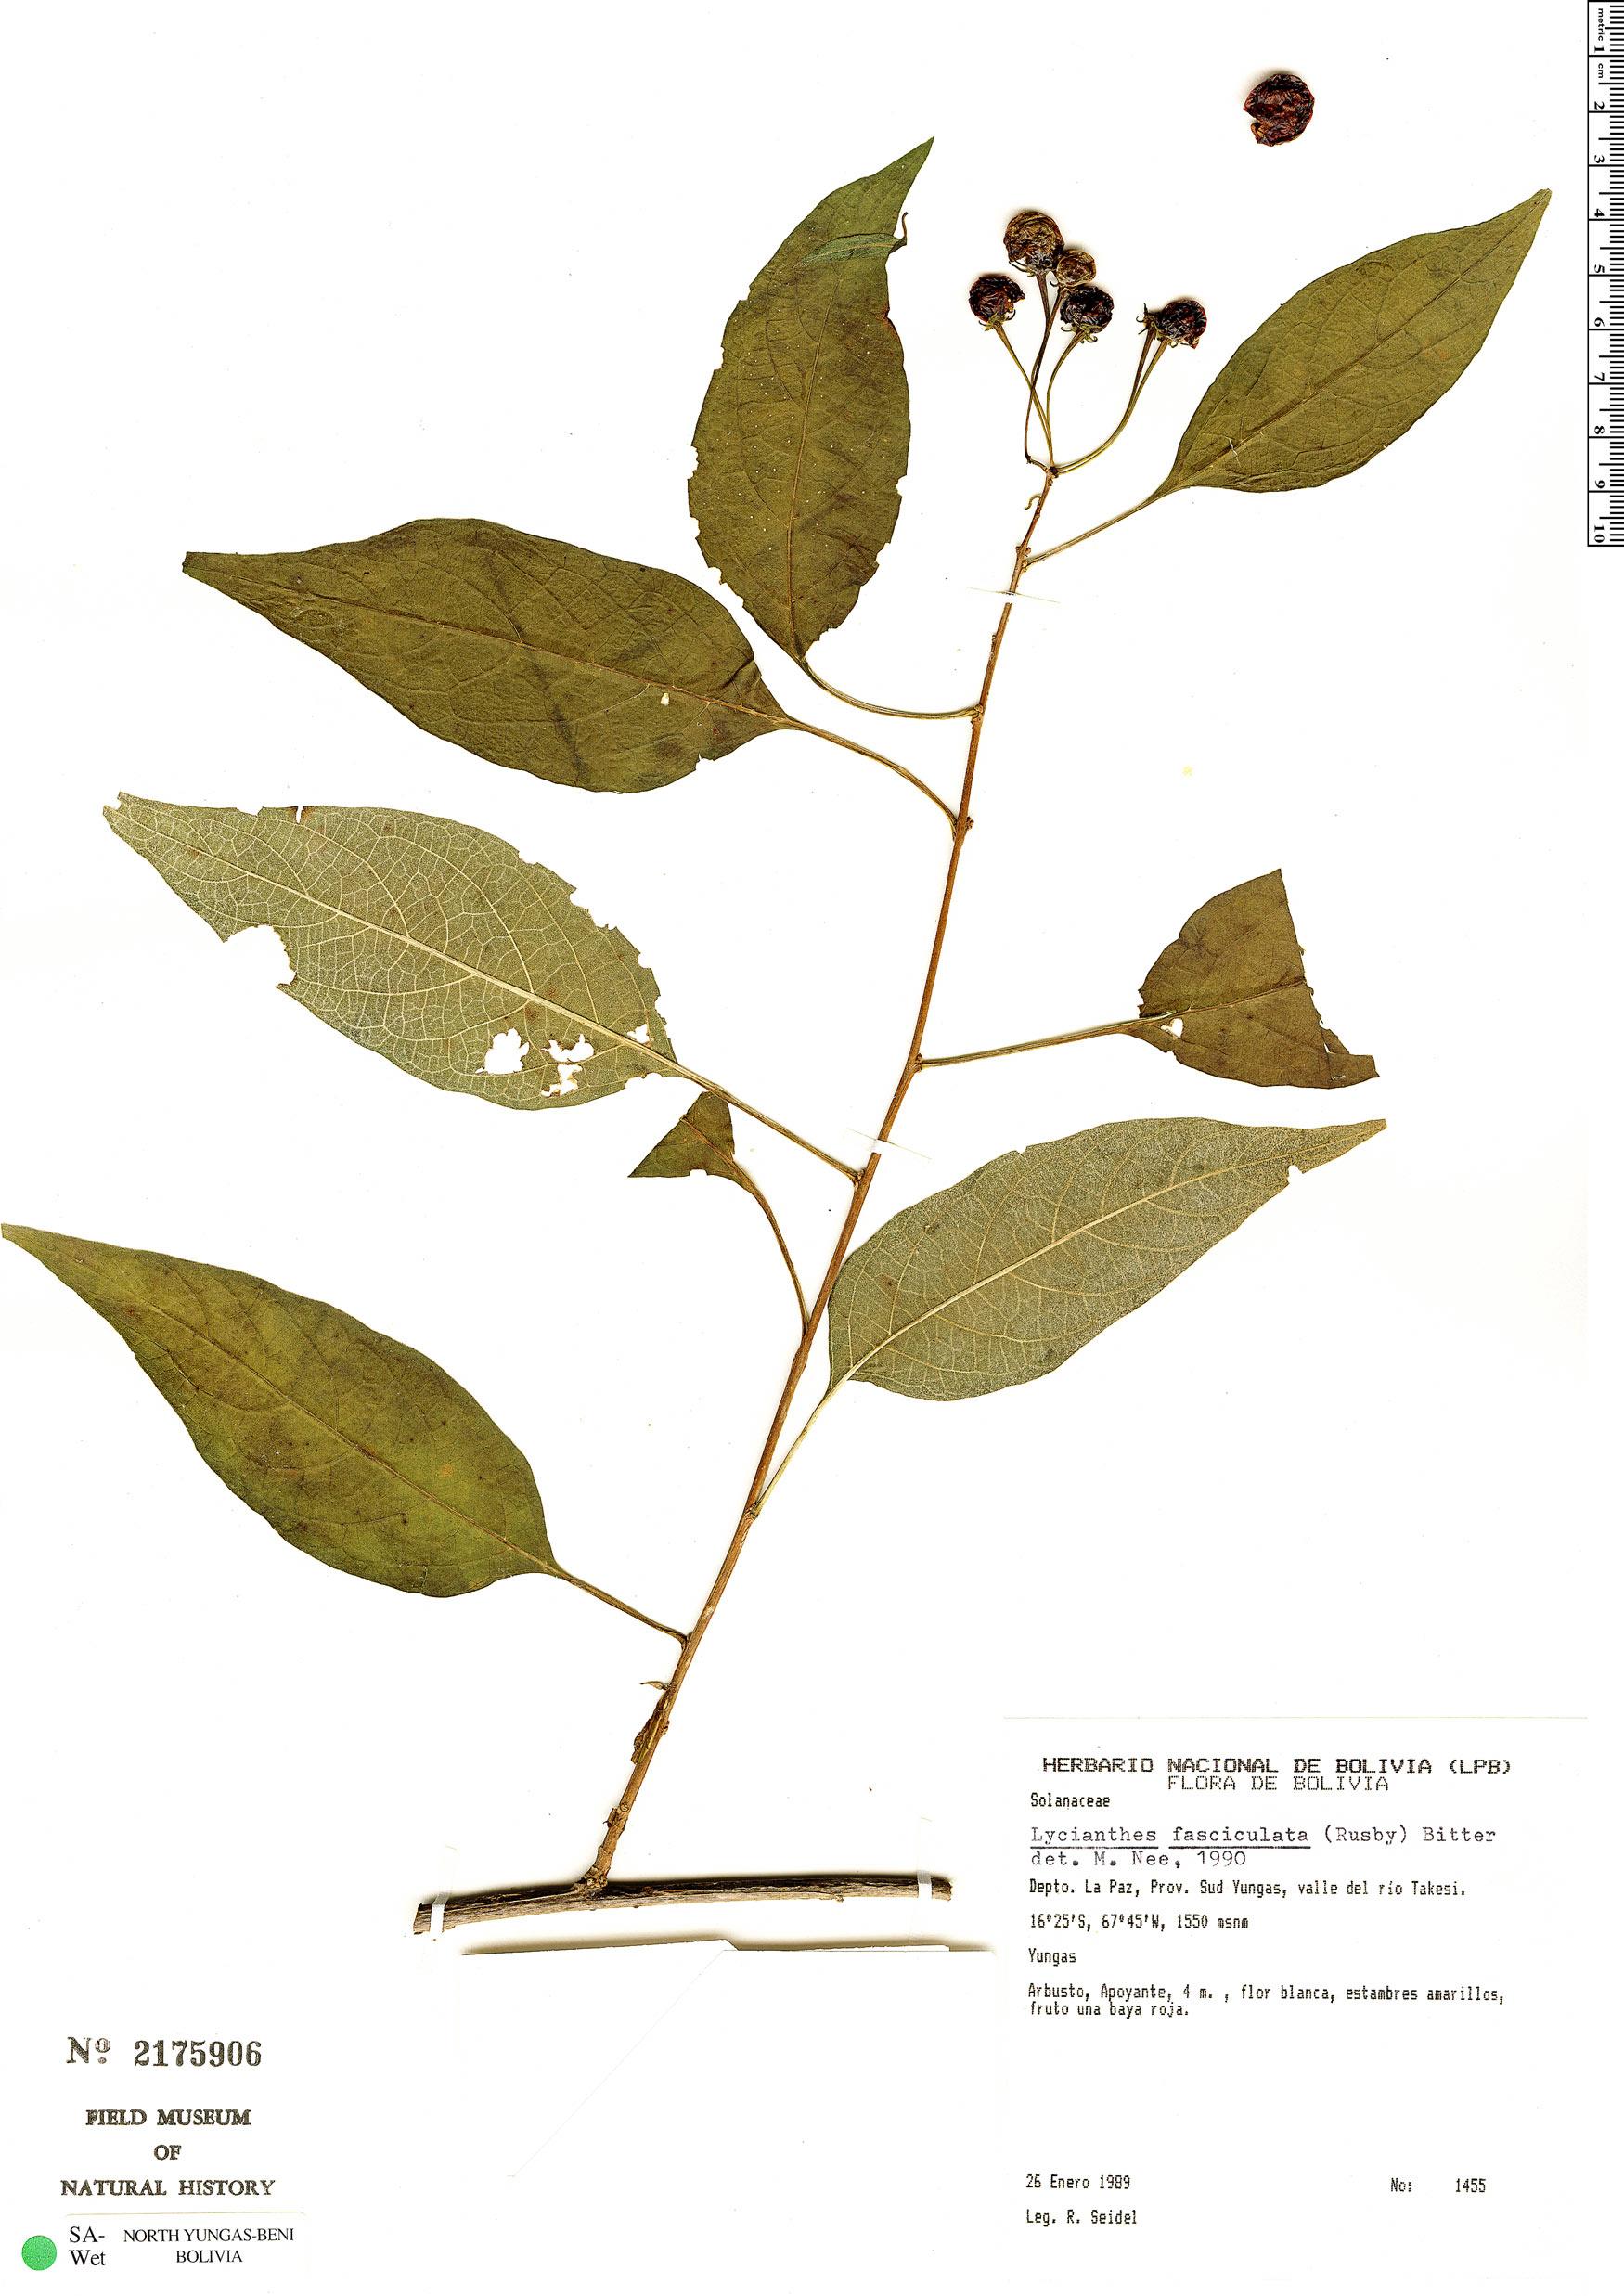 Espécime: Lycianthes fasciculata